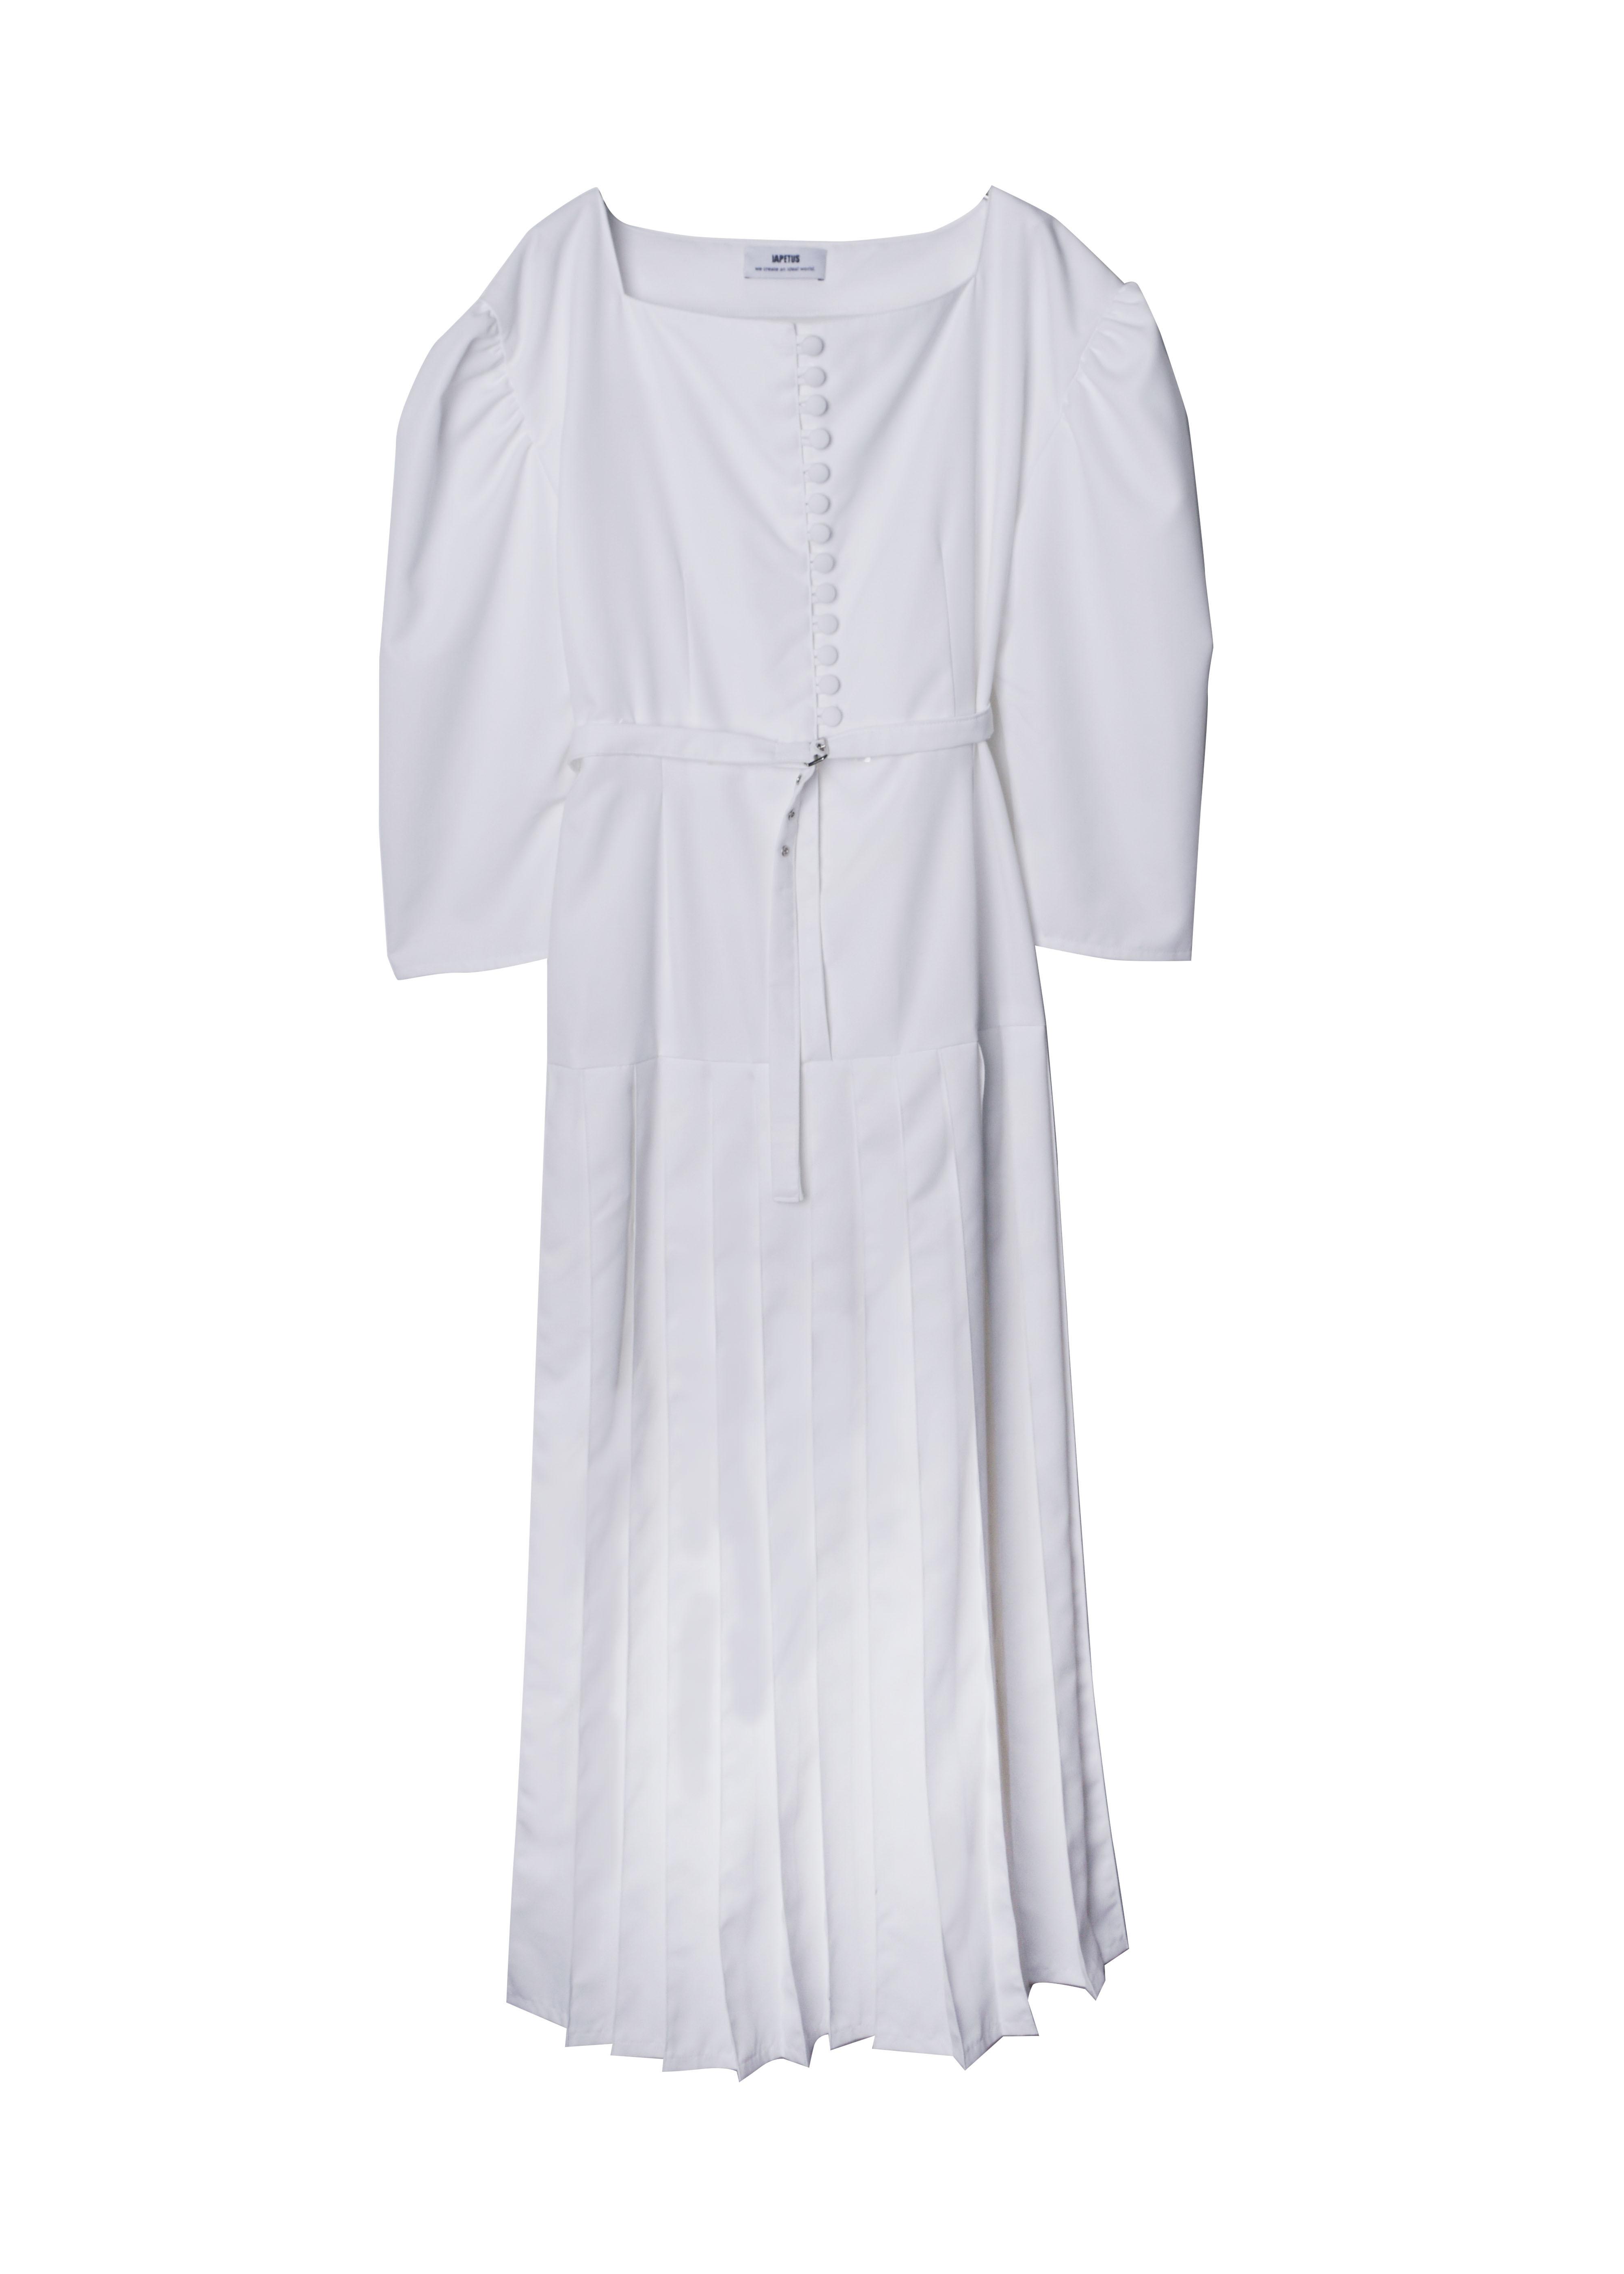 IAPETUS PLEATS DRESS【内金50%】